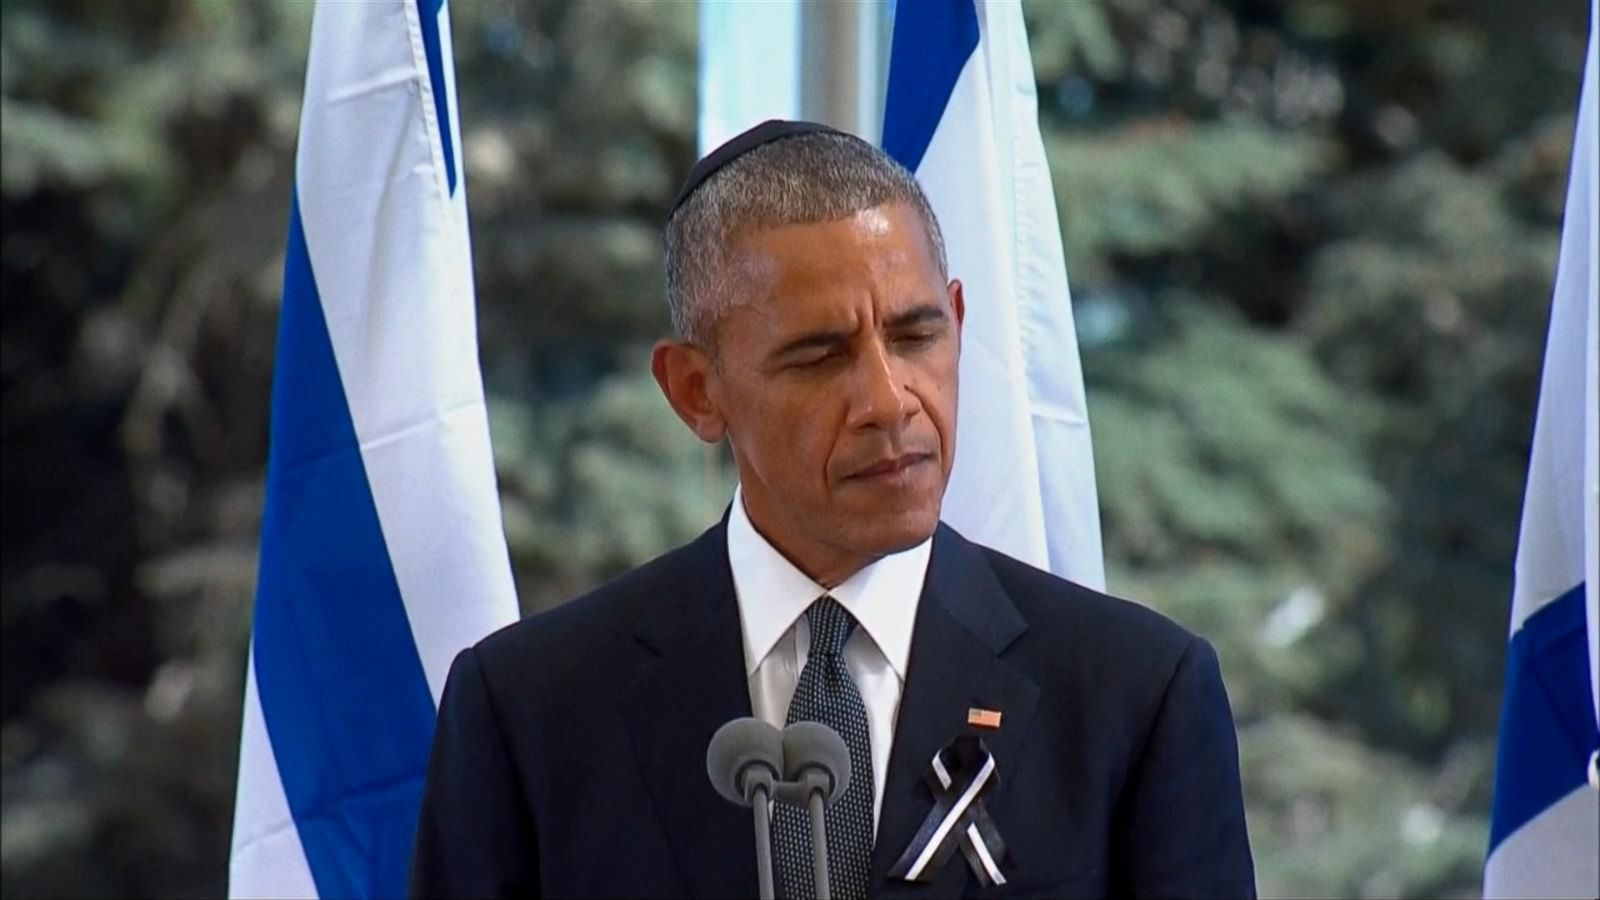 VIDEO: President Obama Attends Funeral of Former Israeli President Shimon Peres